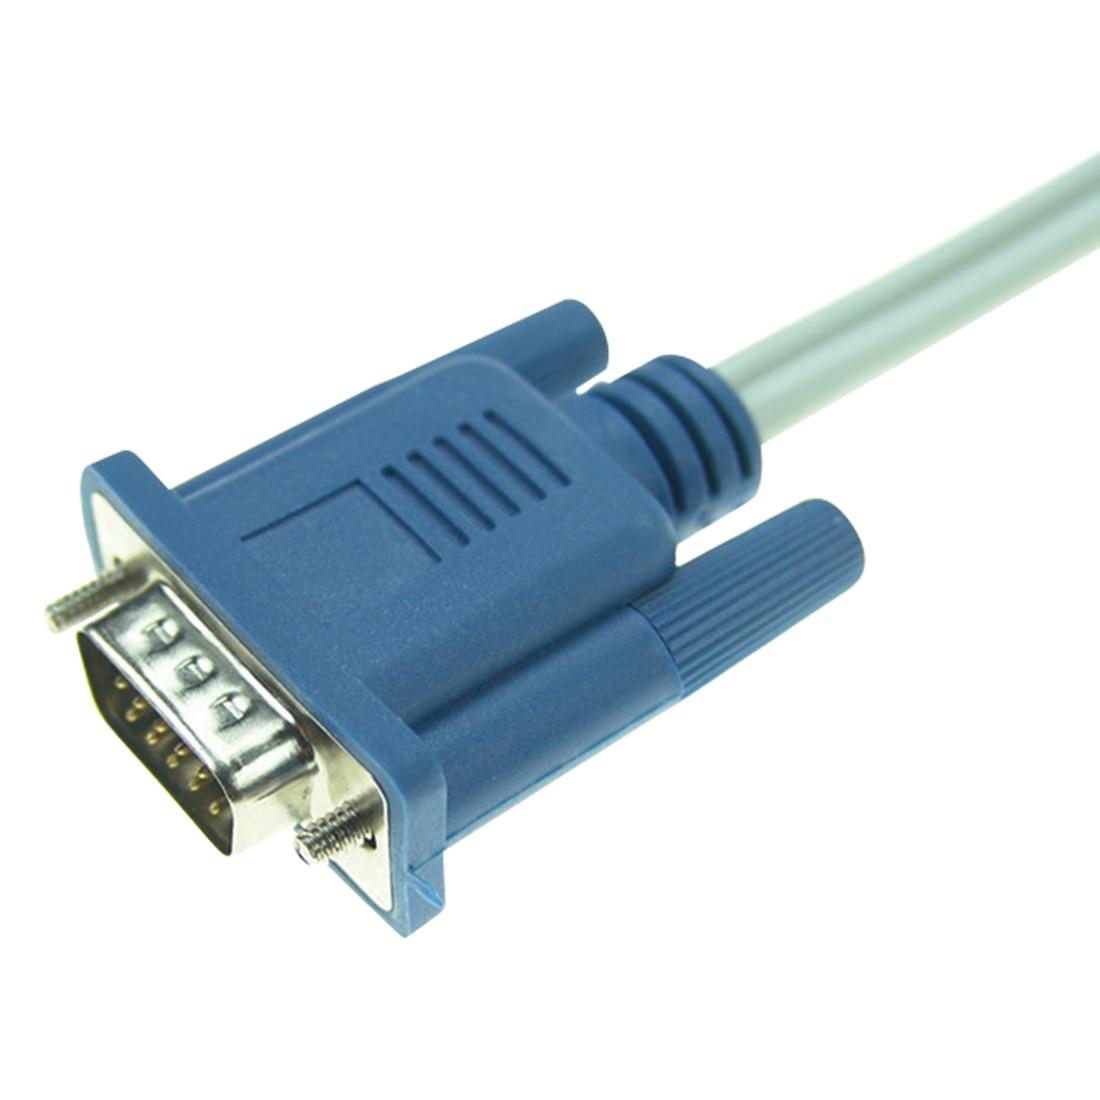 centechia Portable PC Laptop VGA SVGA TO S Video RCA Adapters Plug ...